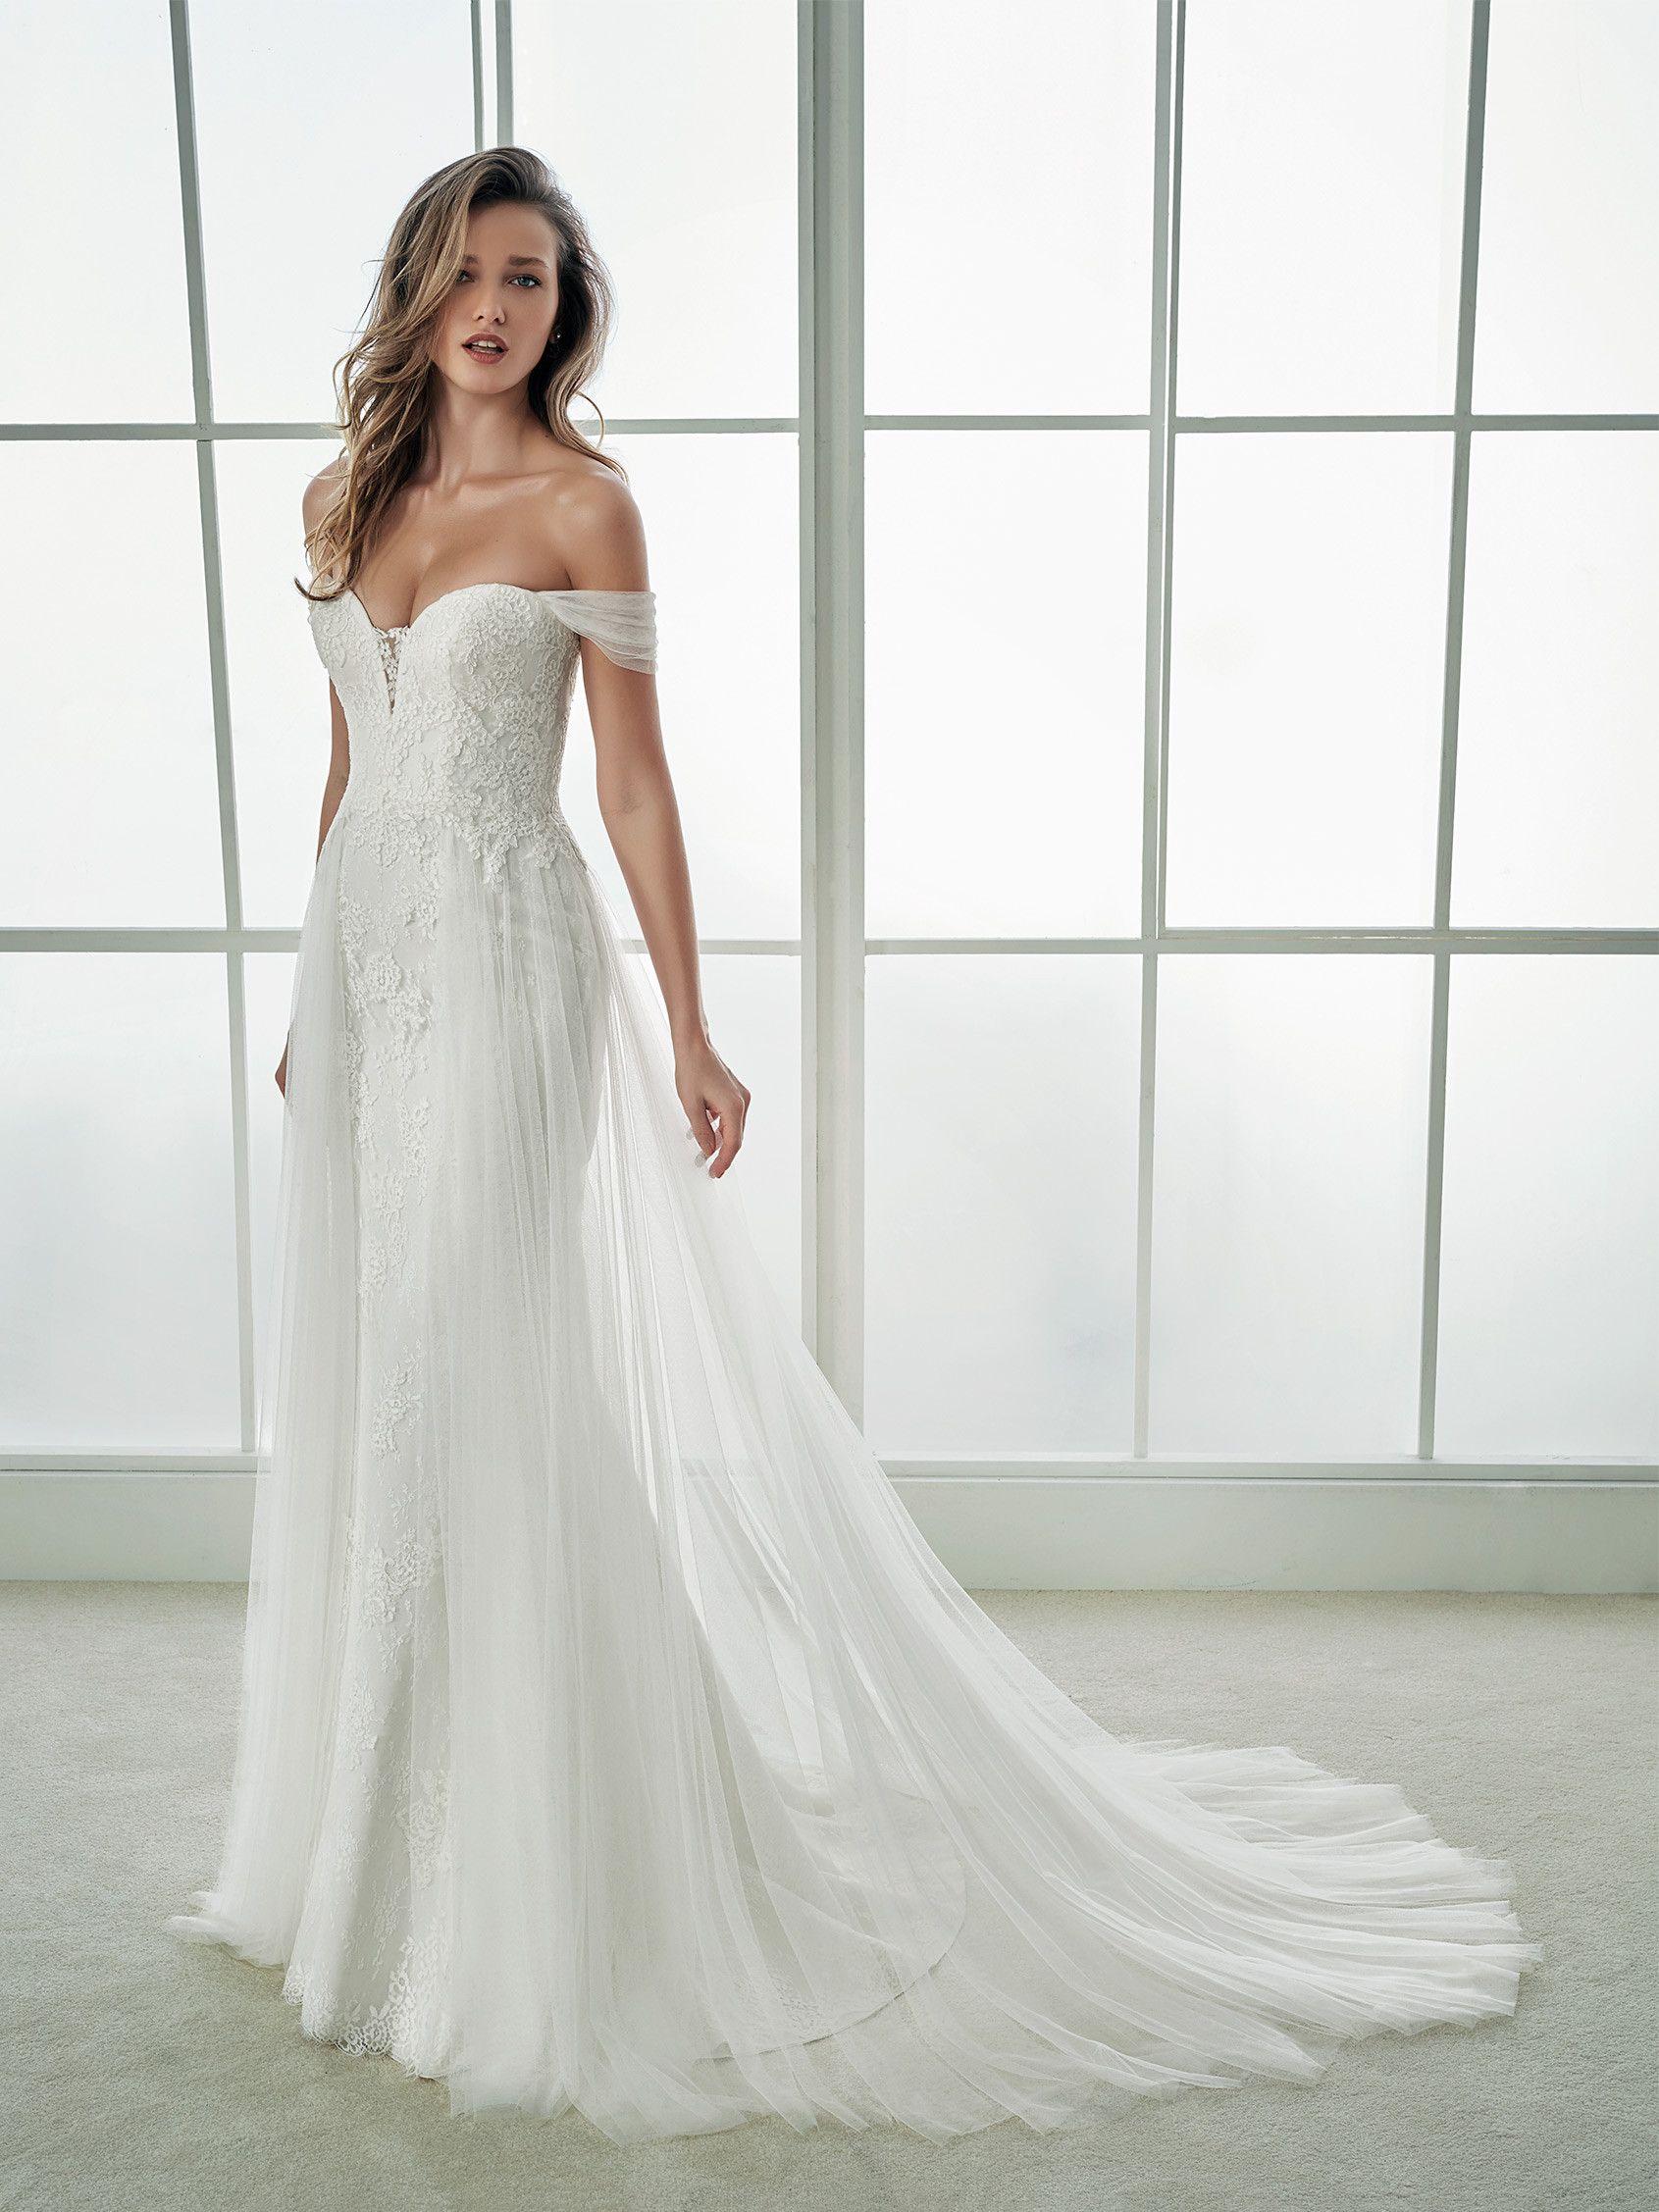 a1ae9ee8b59c Splendido abito da sposa a sirena